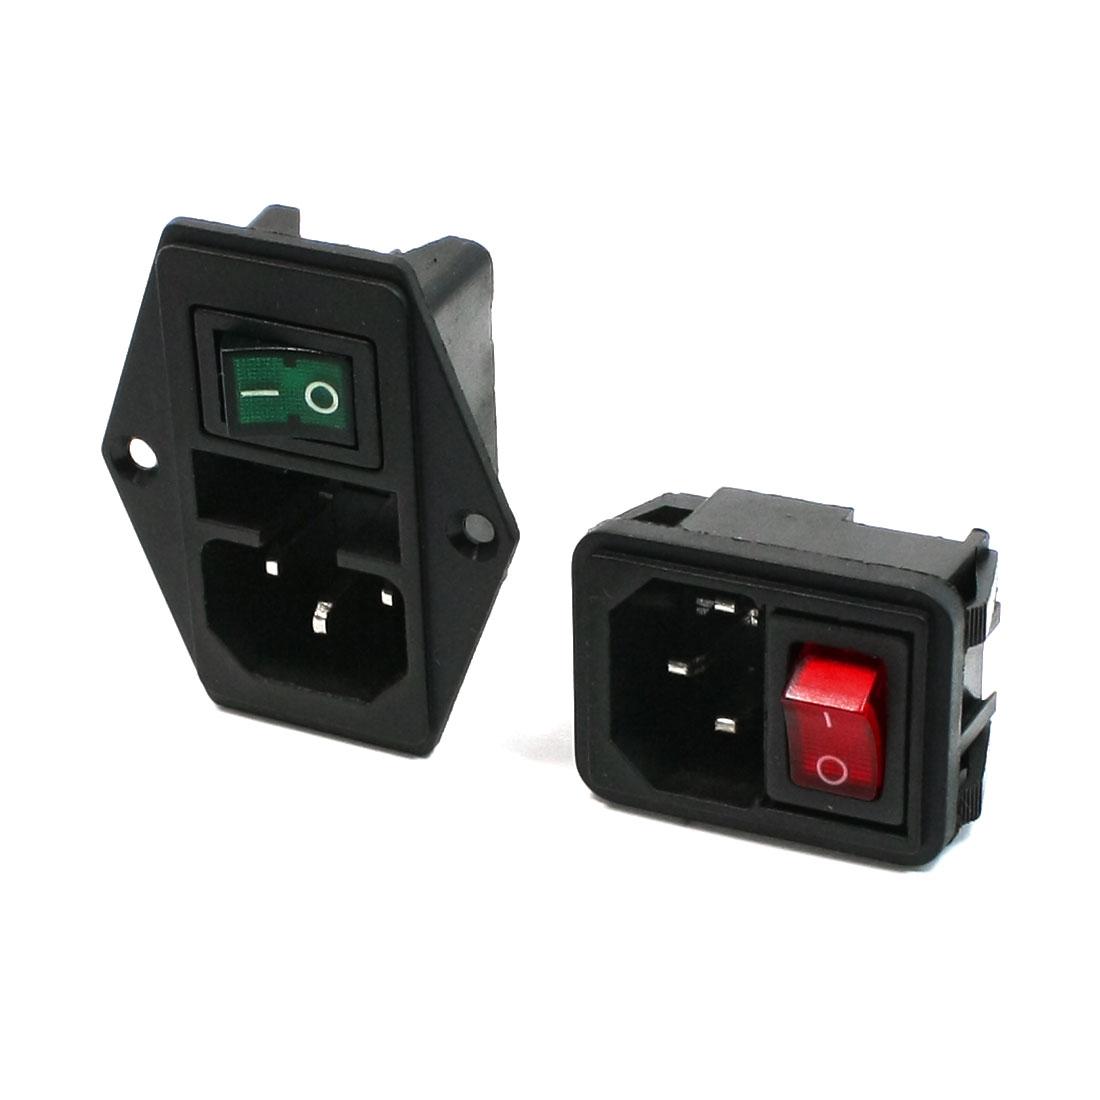 2 Pcs Circuit Connecting IEC320 C14 Inlet Power Socket Set AC 250V 10A